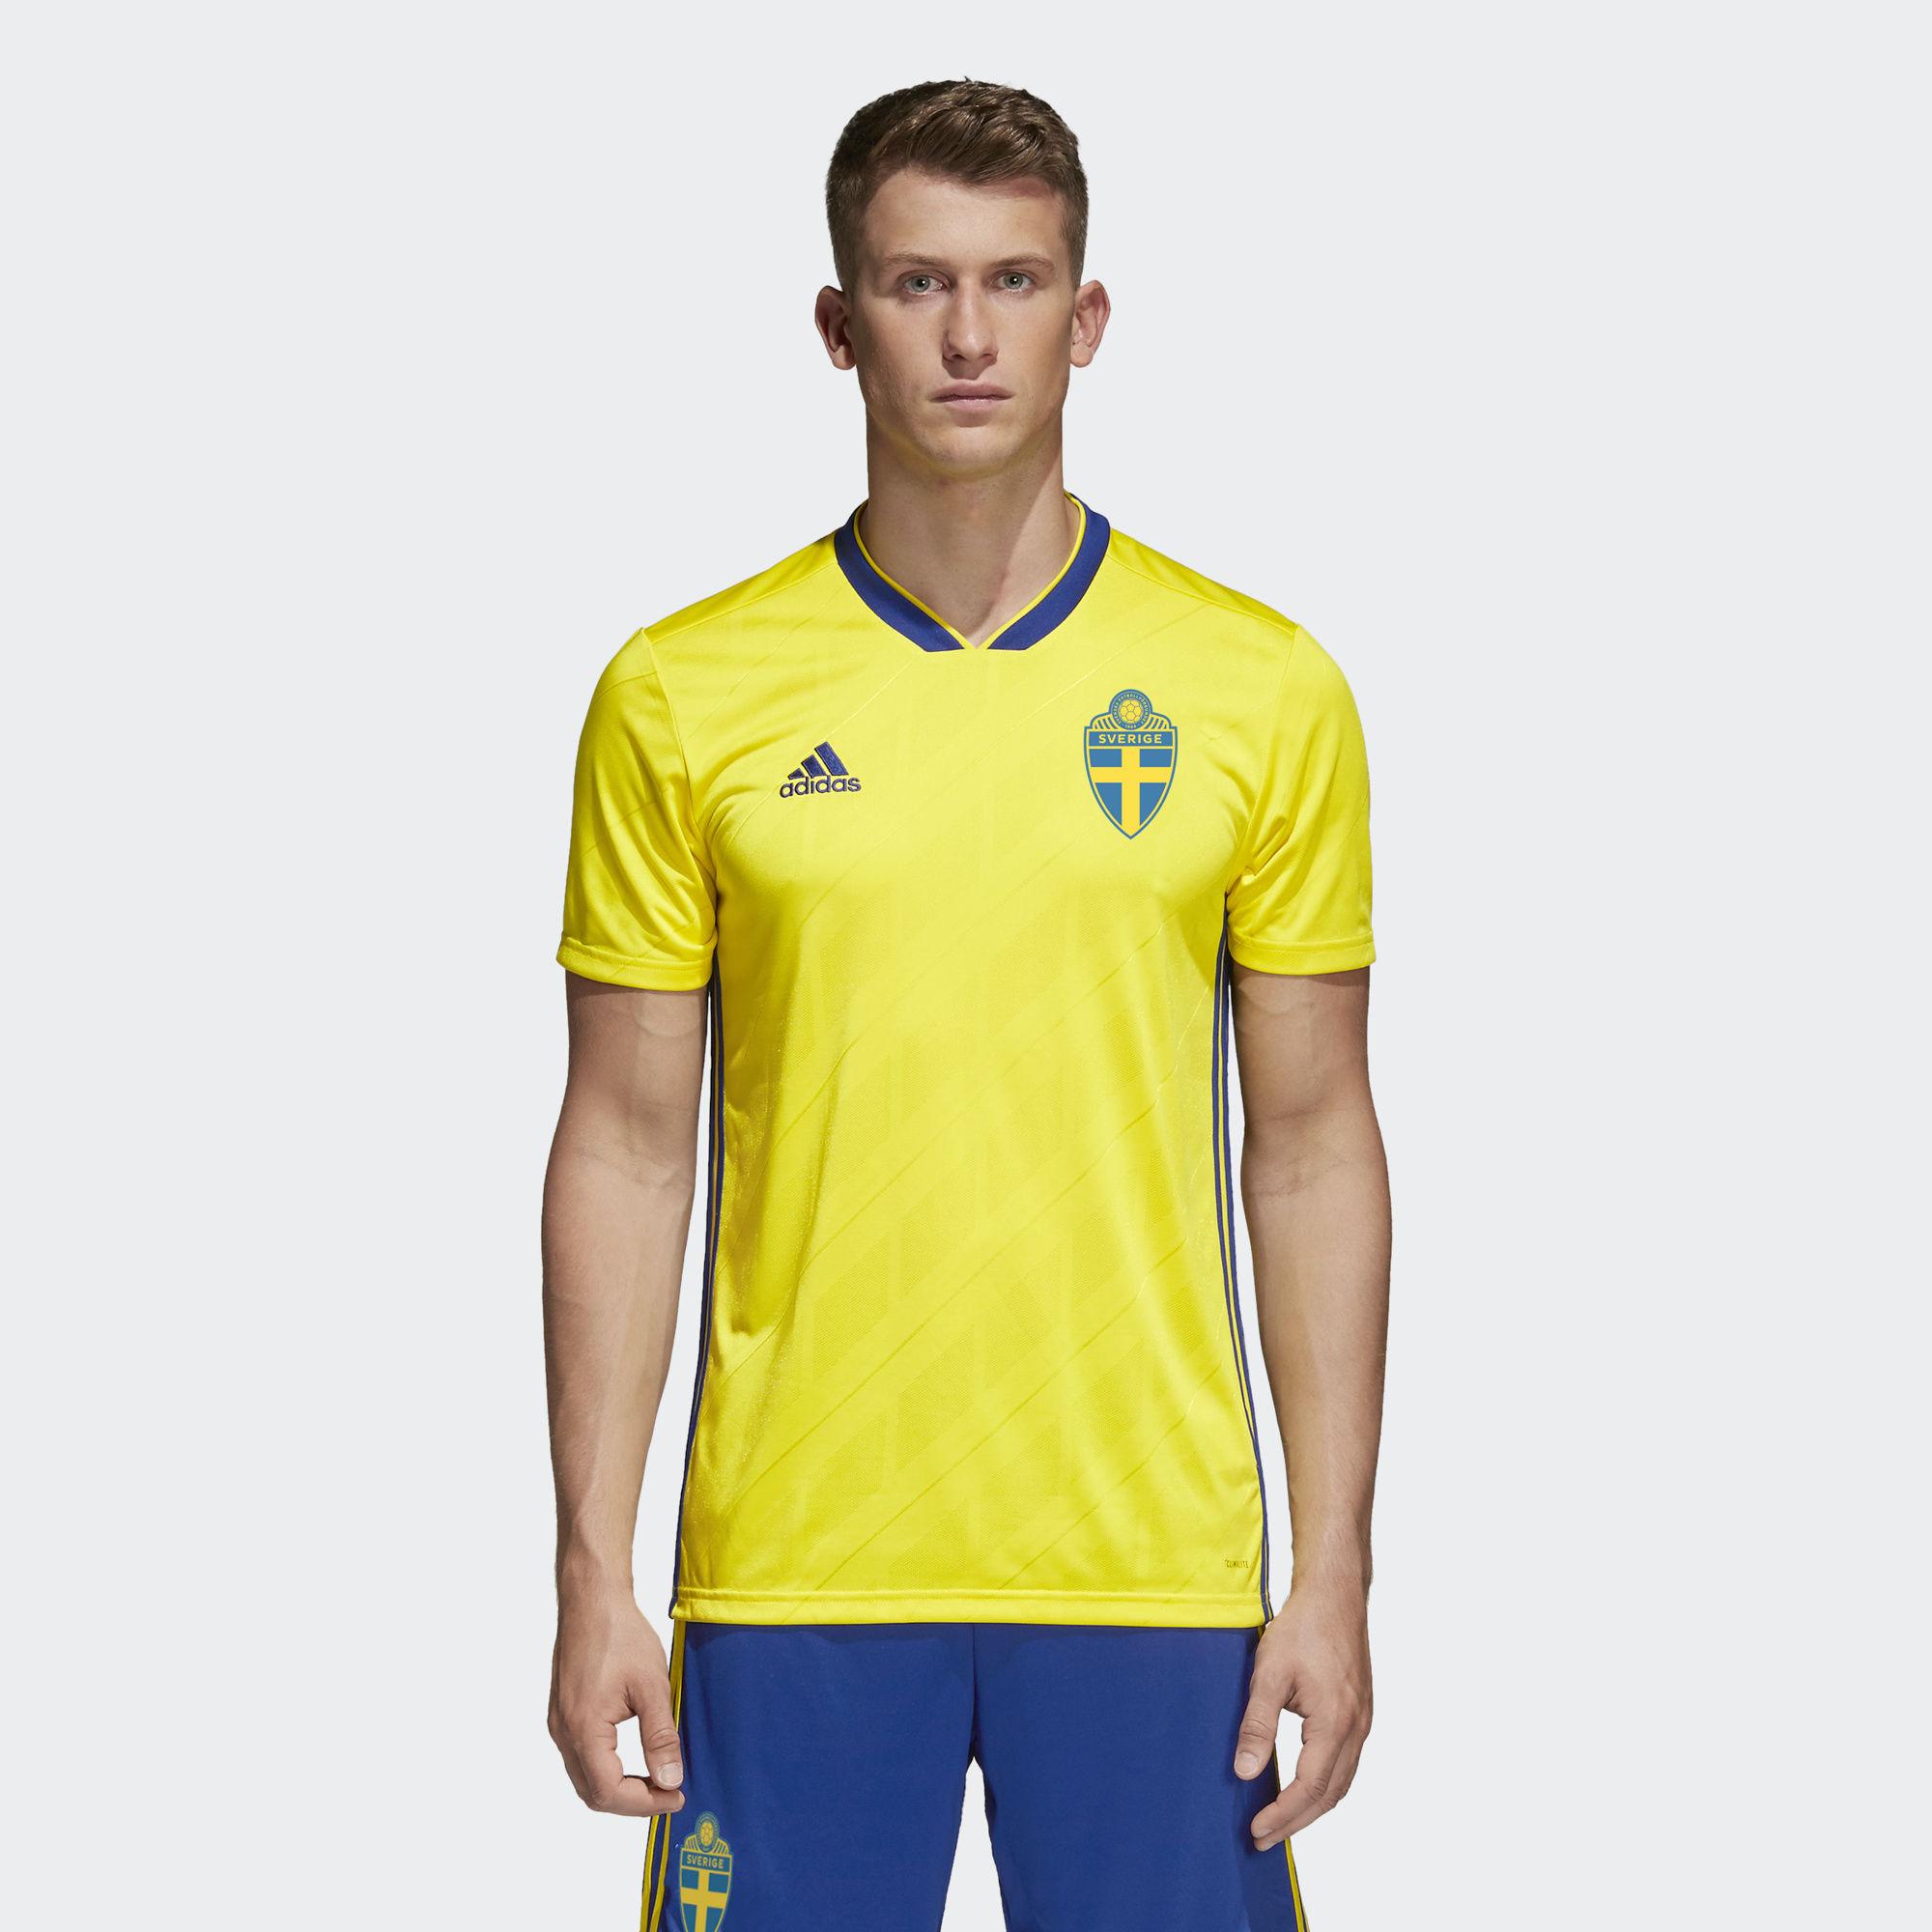 Картинки по запросу sweden 2018 world cup kit